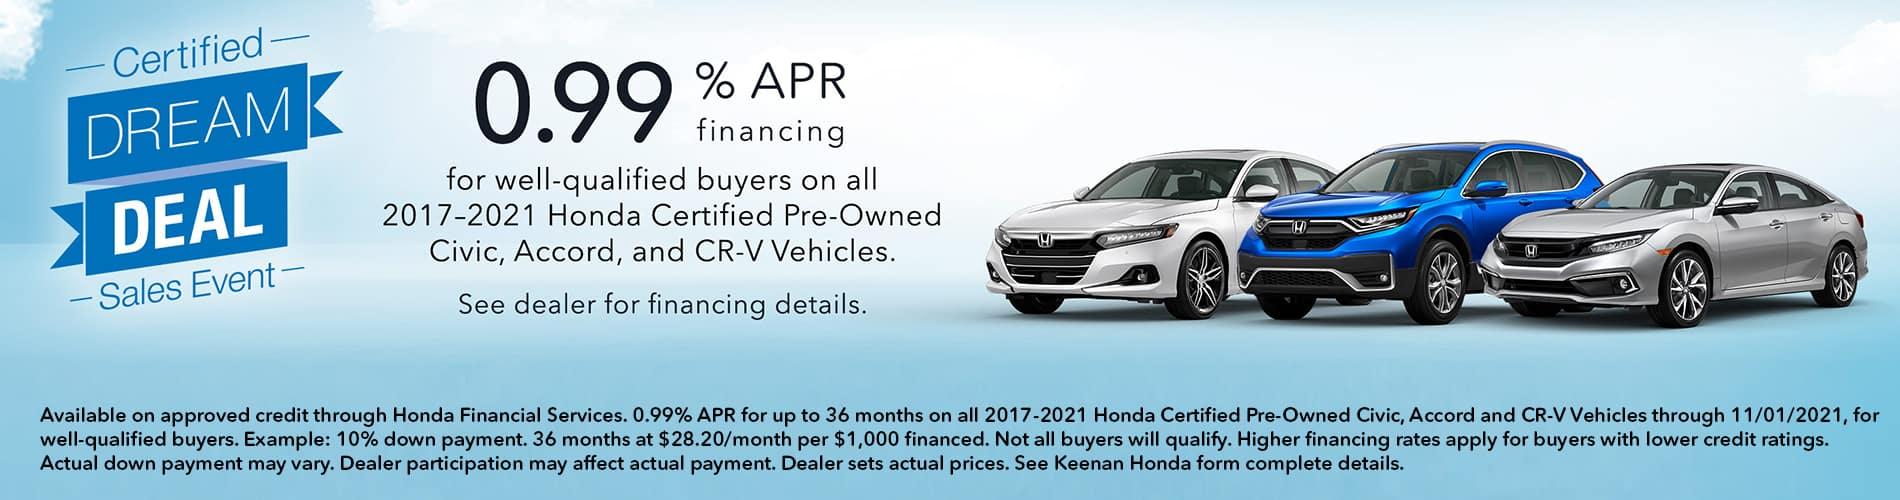 Honda Certified Pre-Owned Vehicles at Keenan Honda